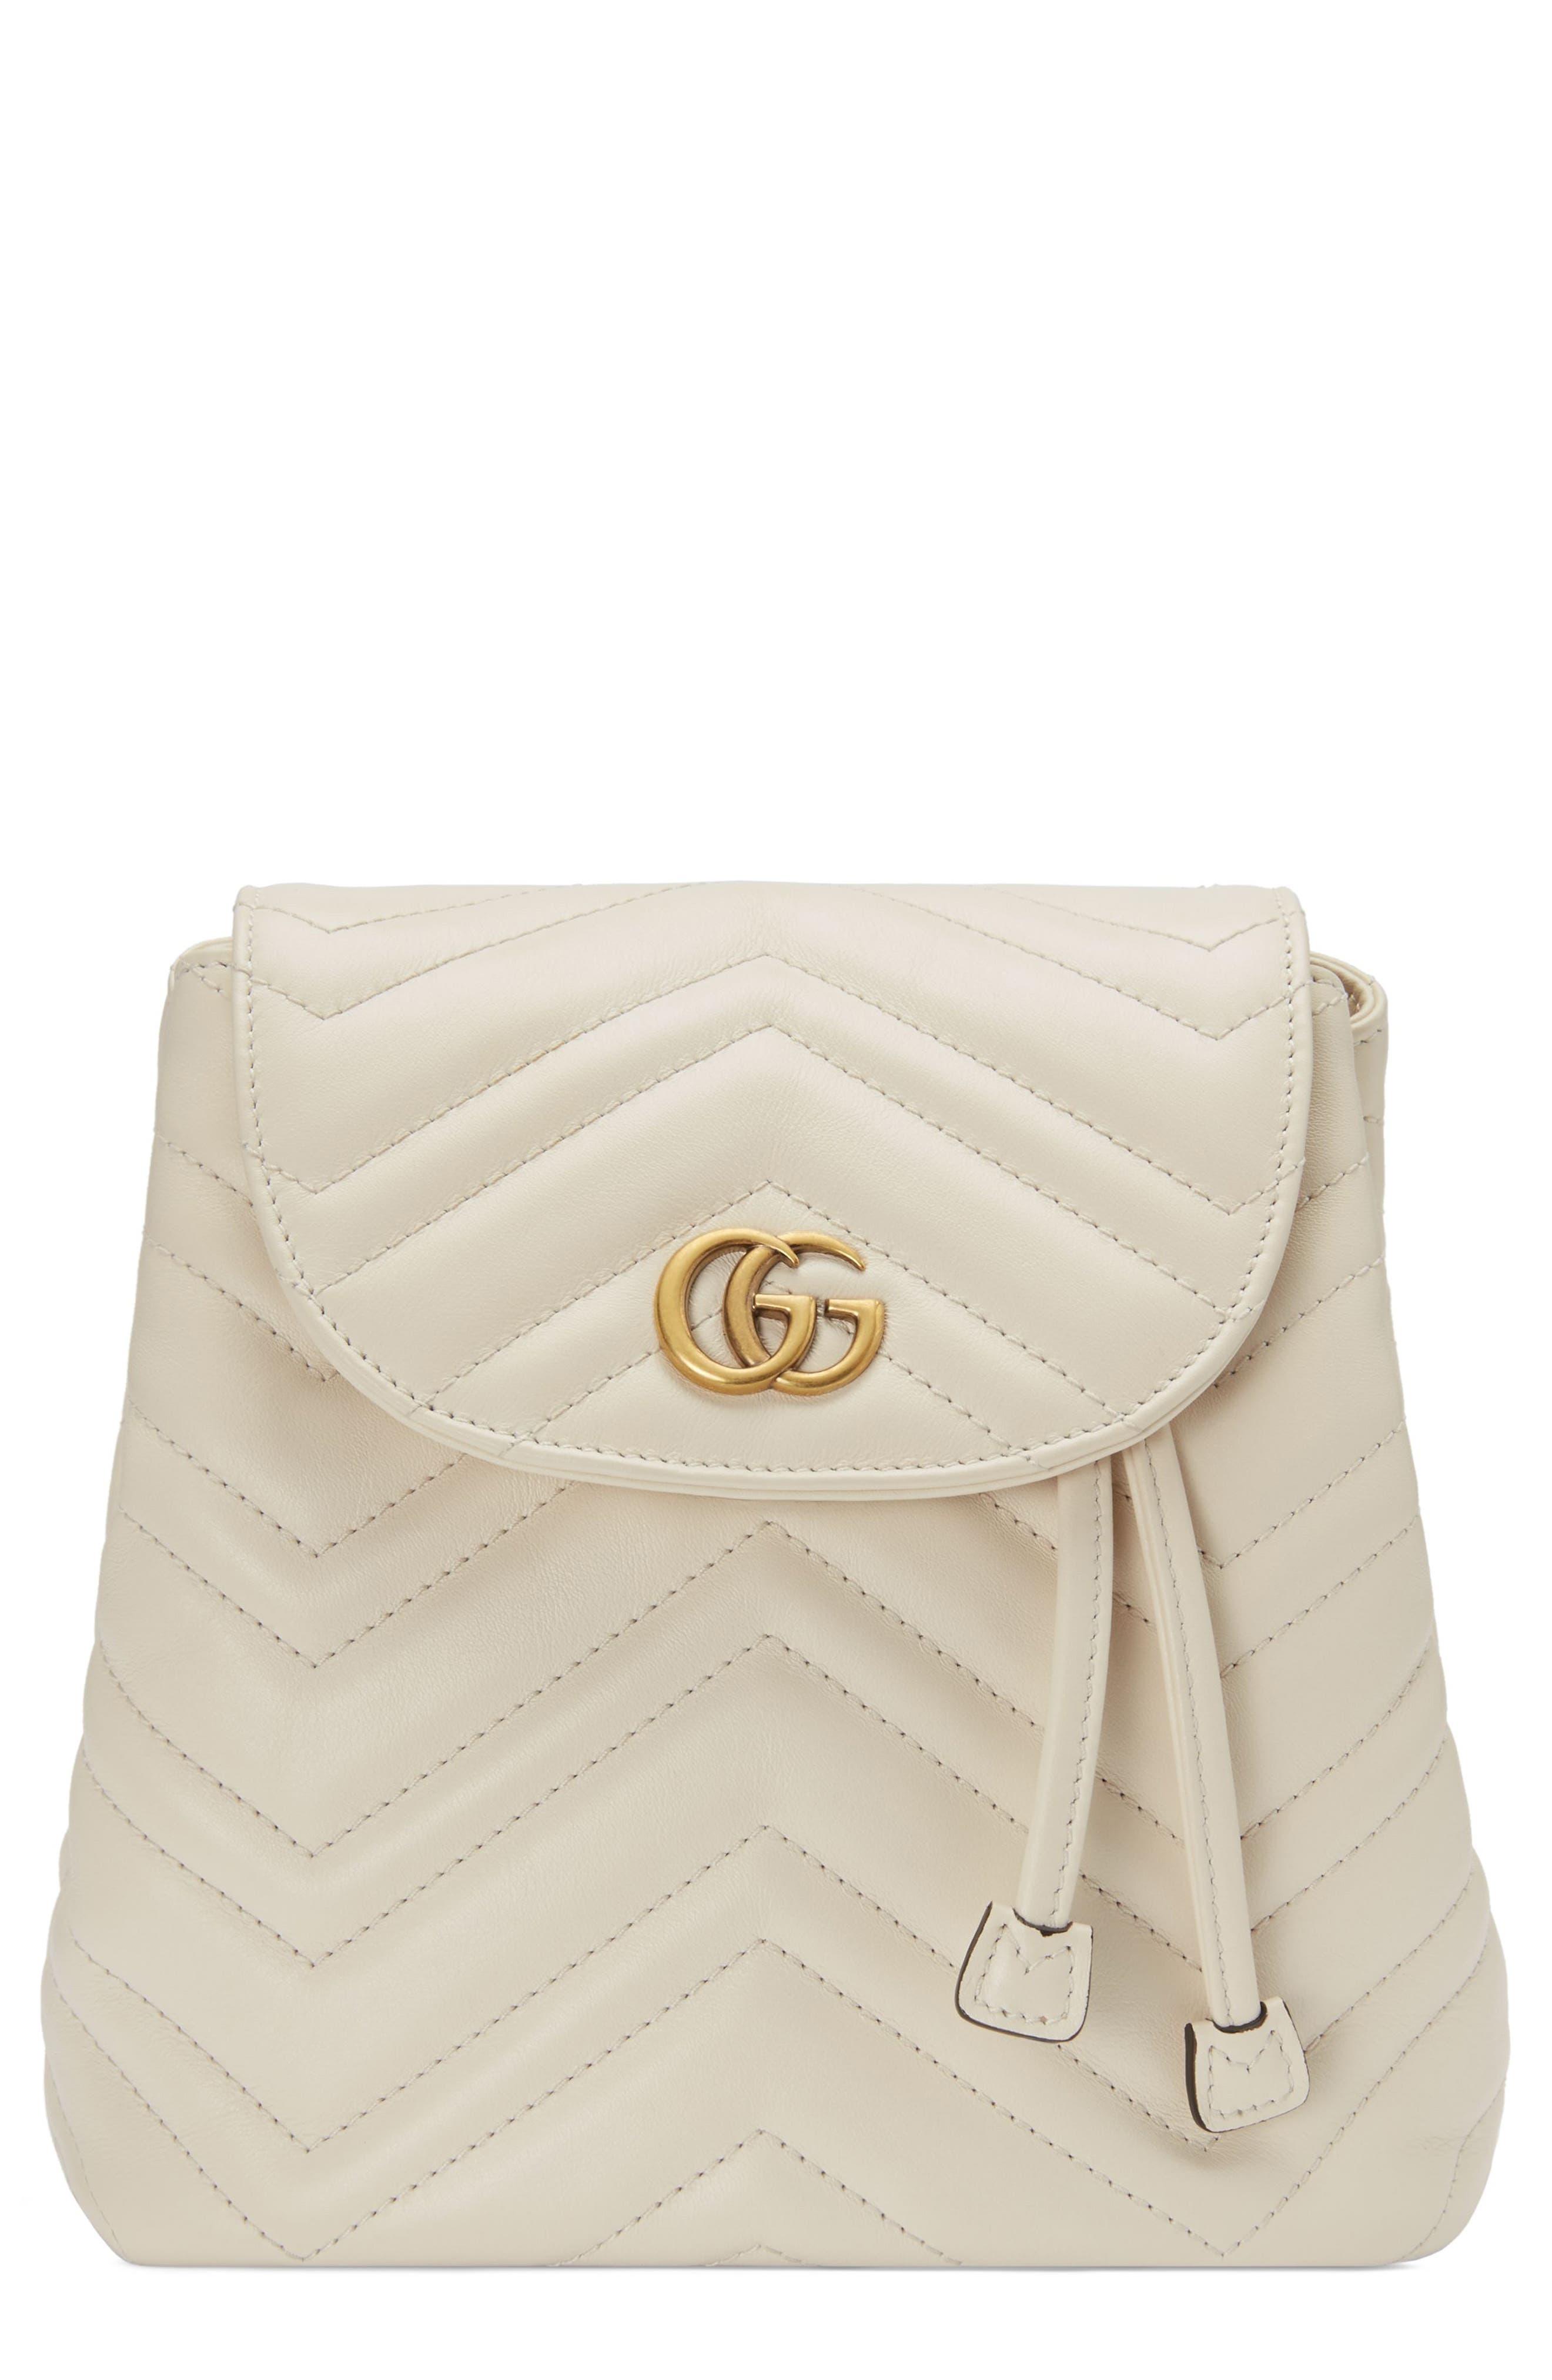 GUCCI, GG Marmont 2.0 Matelassé Leather Mini Backpack, Main thumbnail 1, color, MYSTIC WHITE